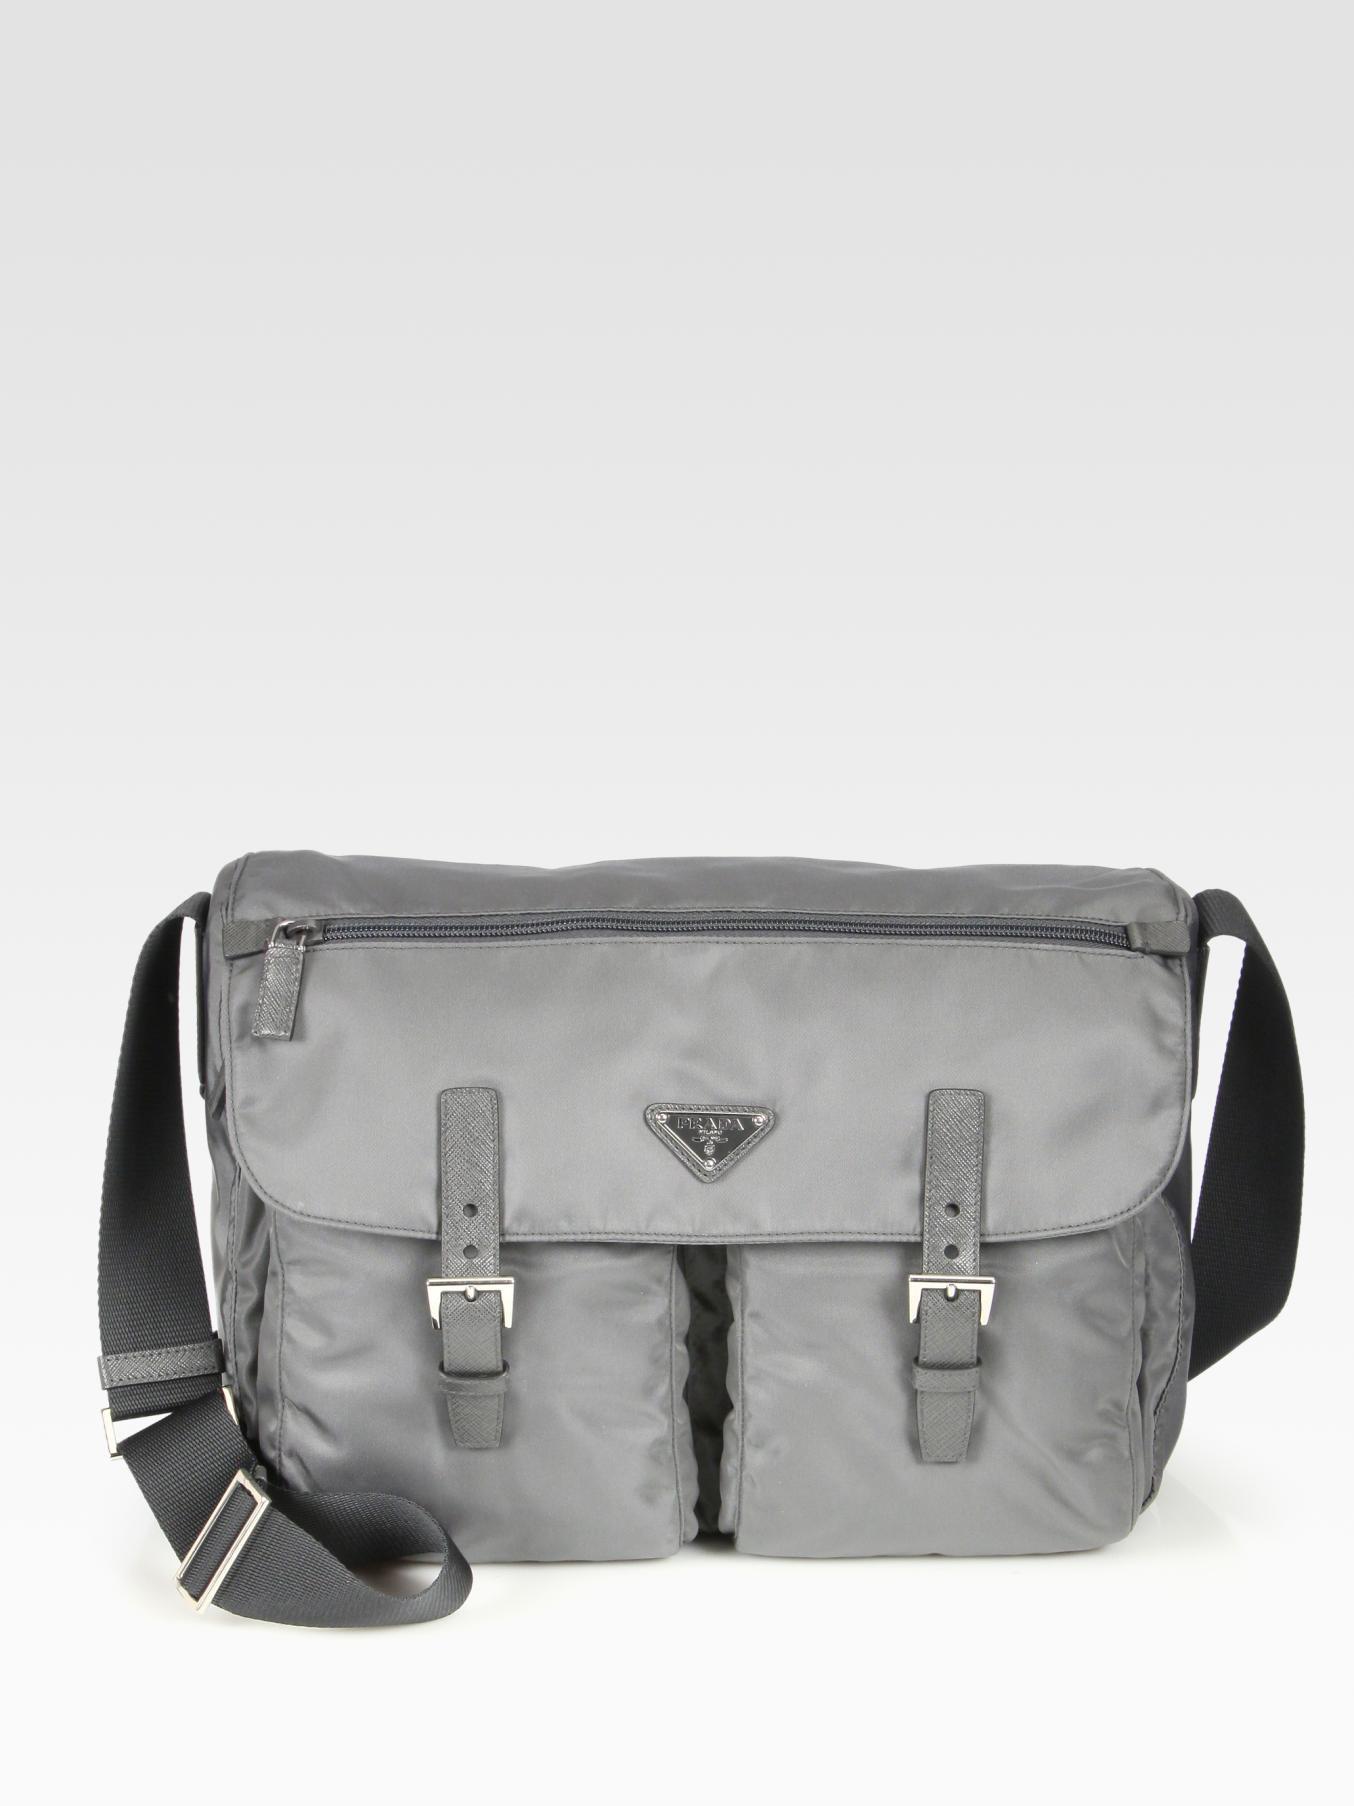 749e0ea4e3e4 Lyst - Prada Vela Messenger Bag in Gray for Men